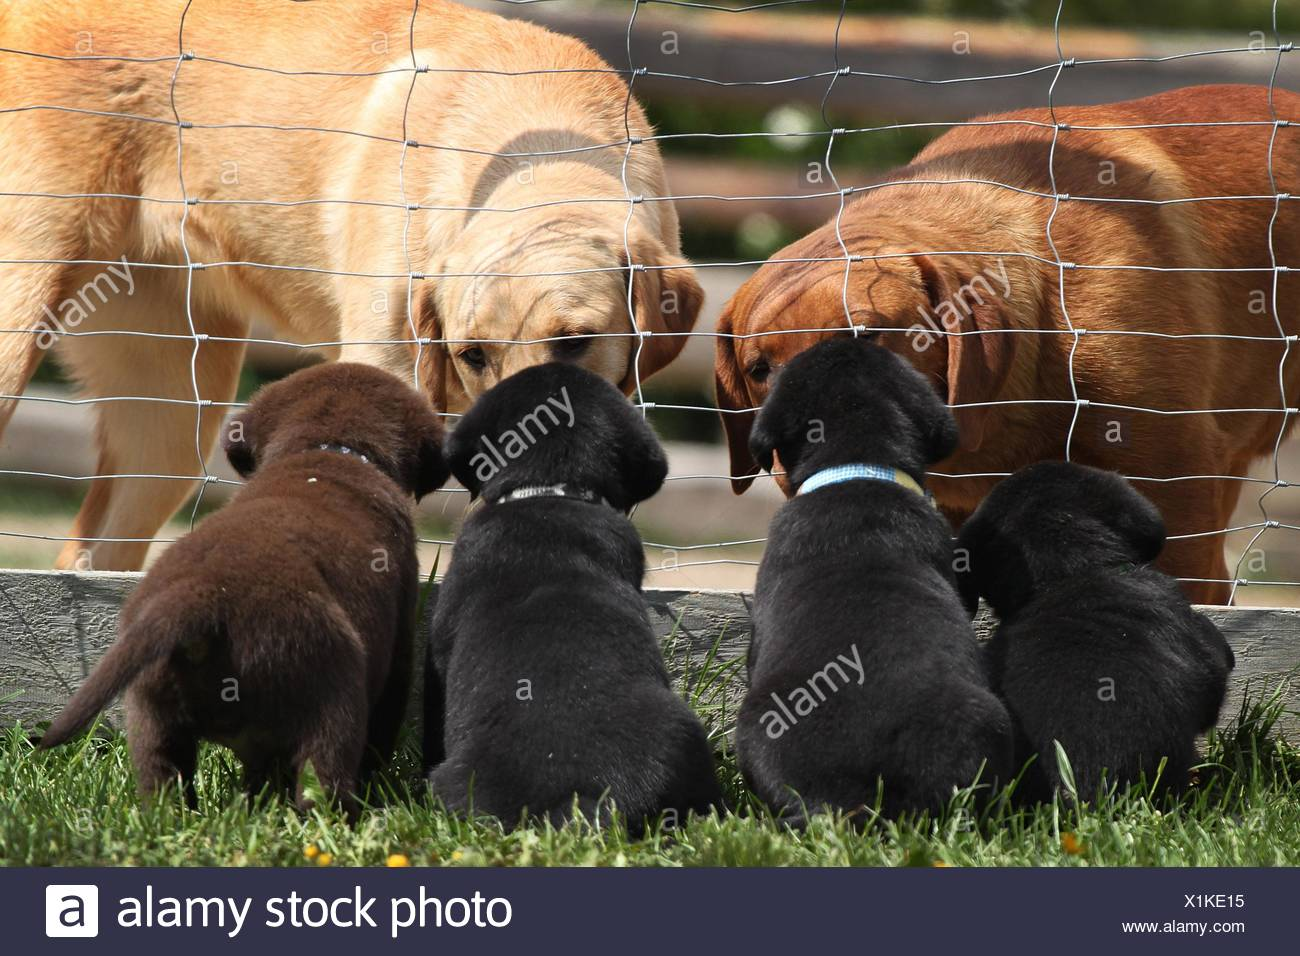 Labrador Retriever Puppies - Stock Image